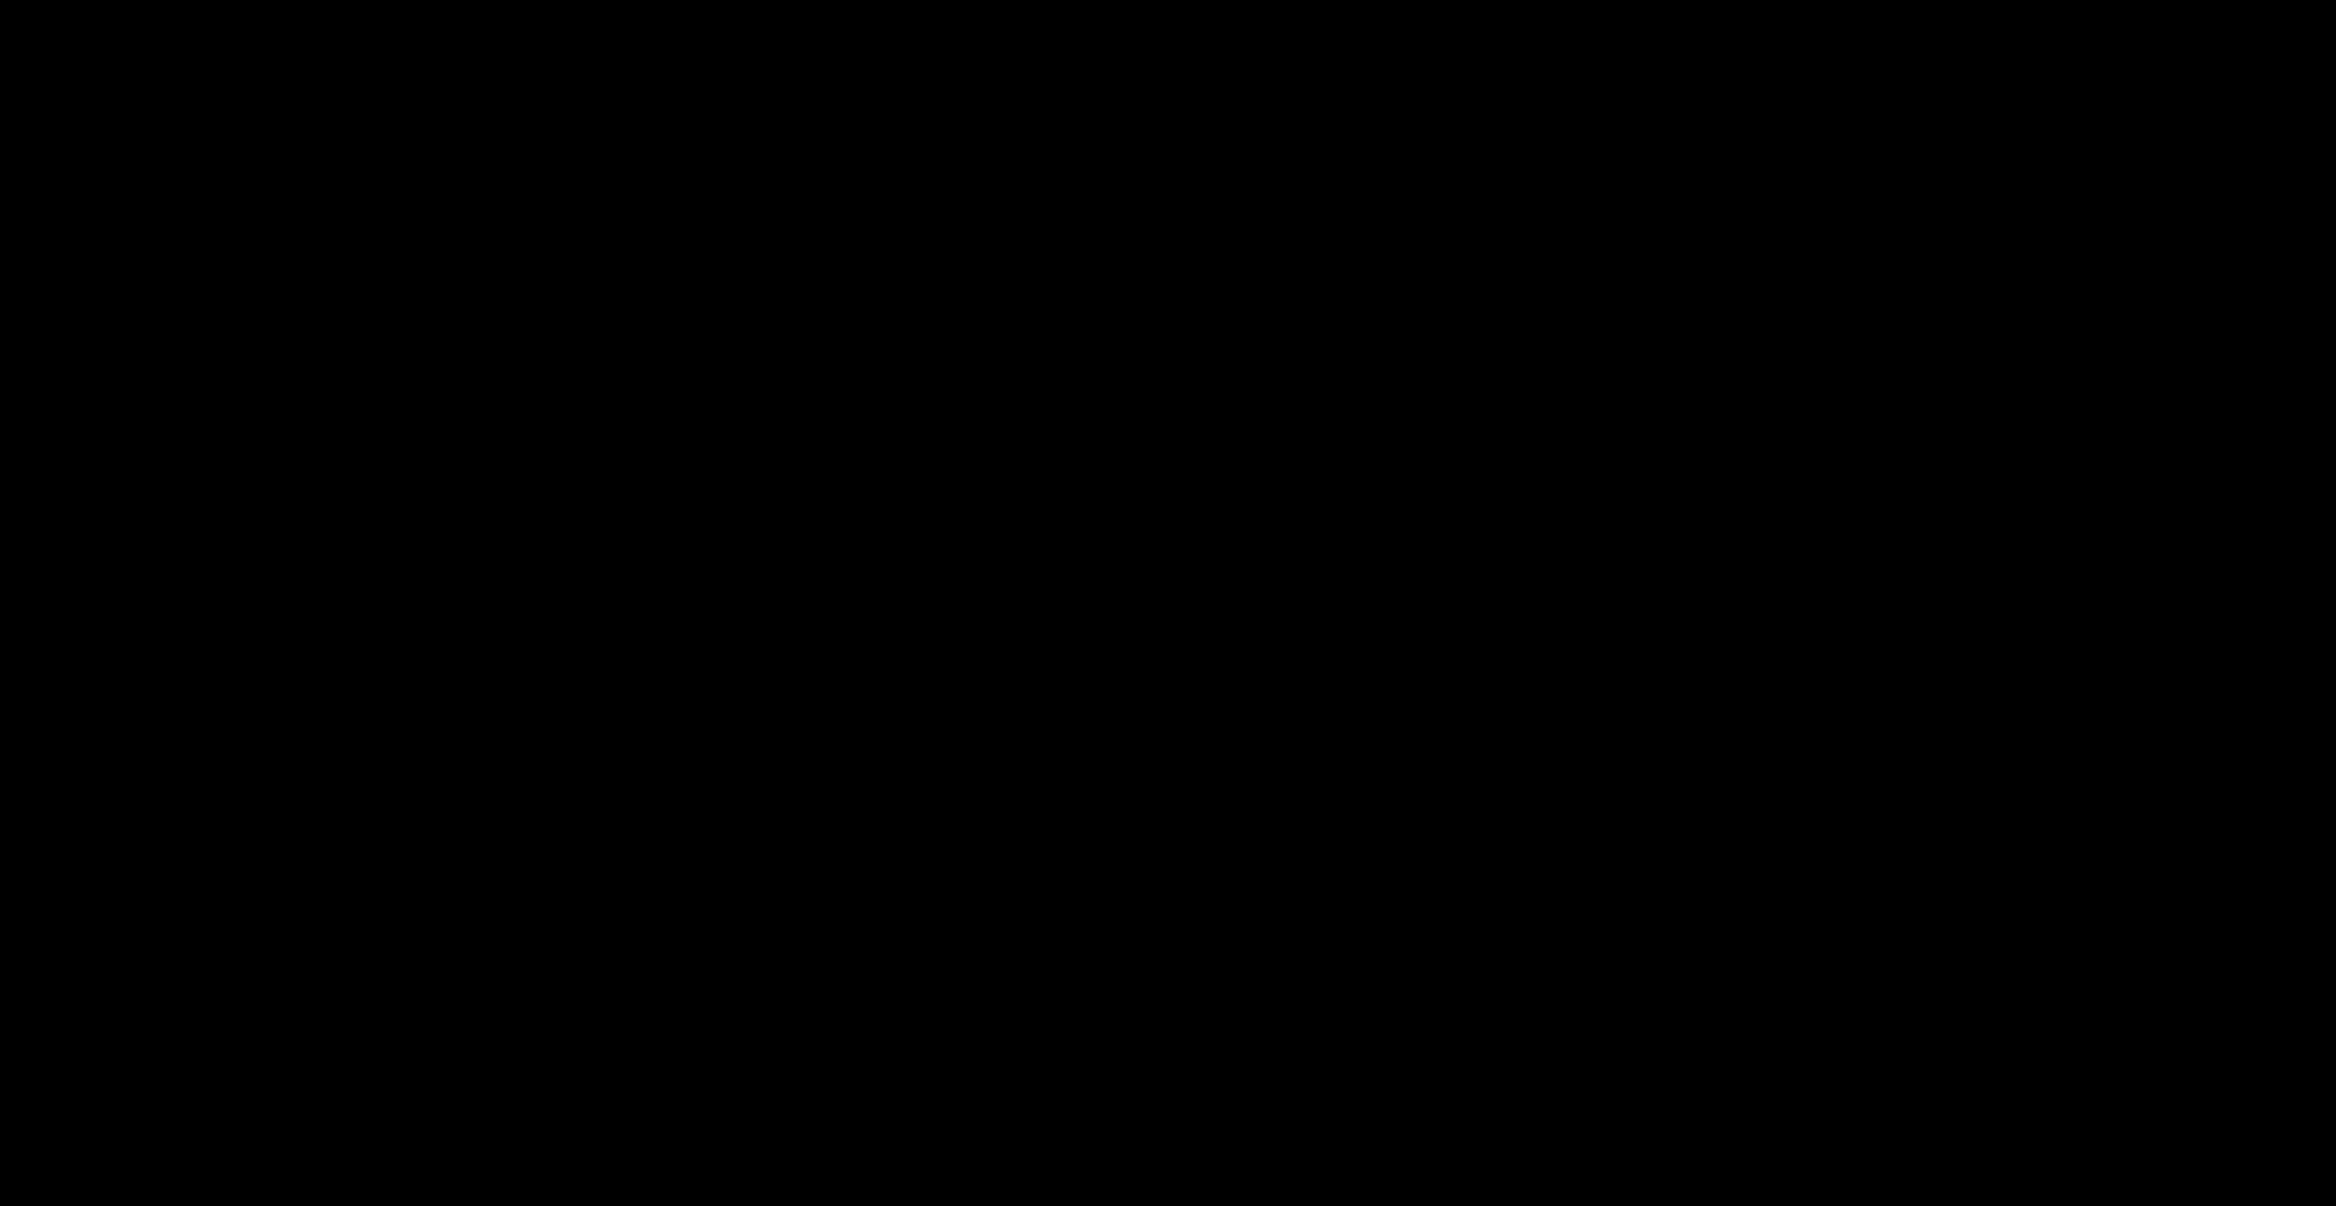 2336x1206 Clipart